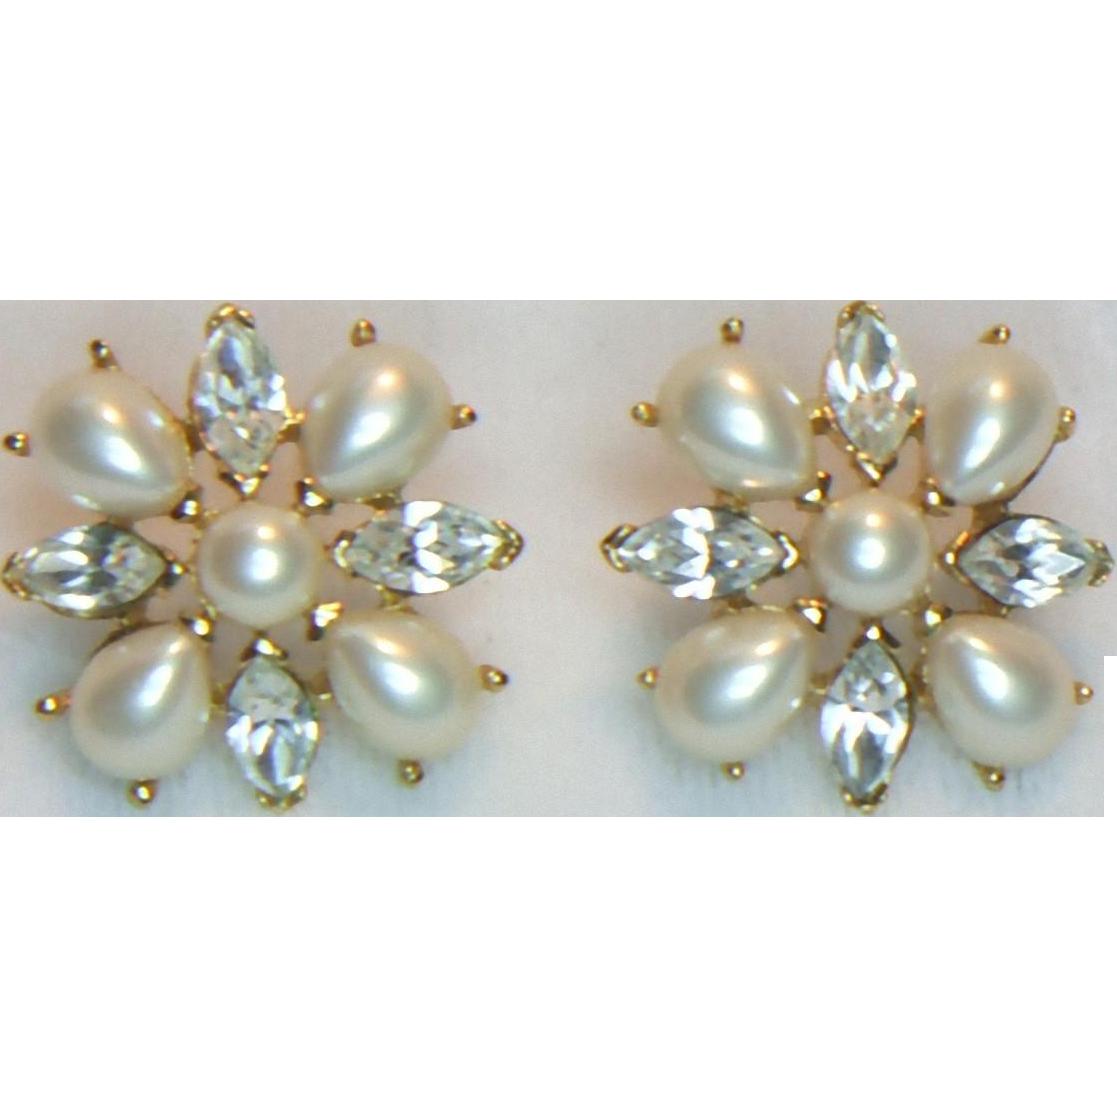 Trifari Faux Pearl and Rhinestone Pierced Earrings